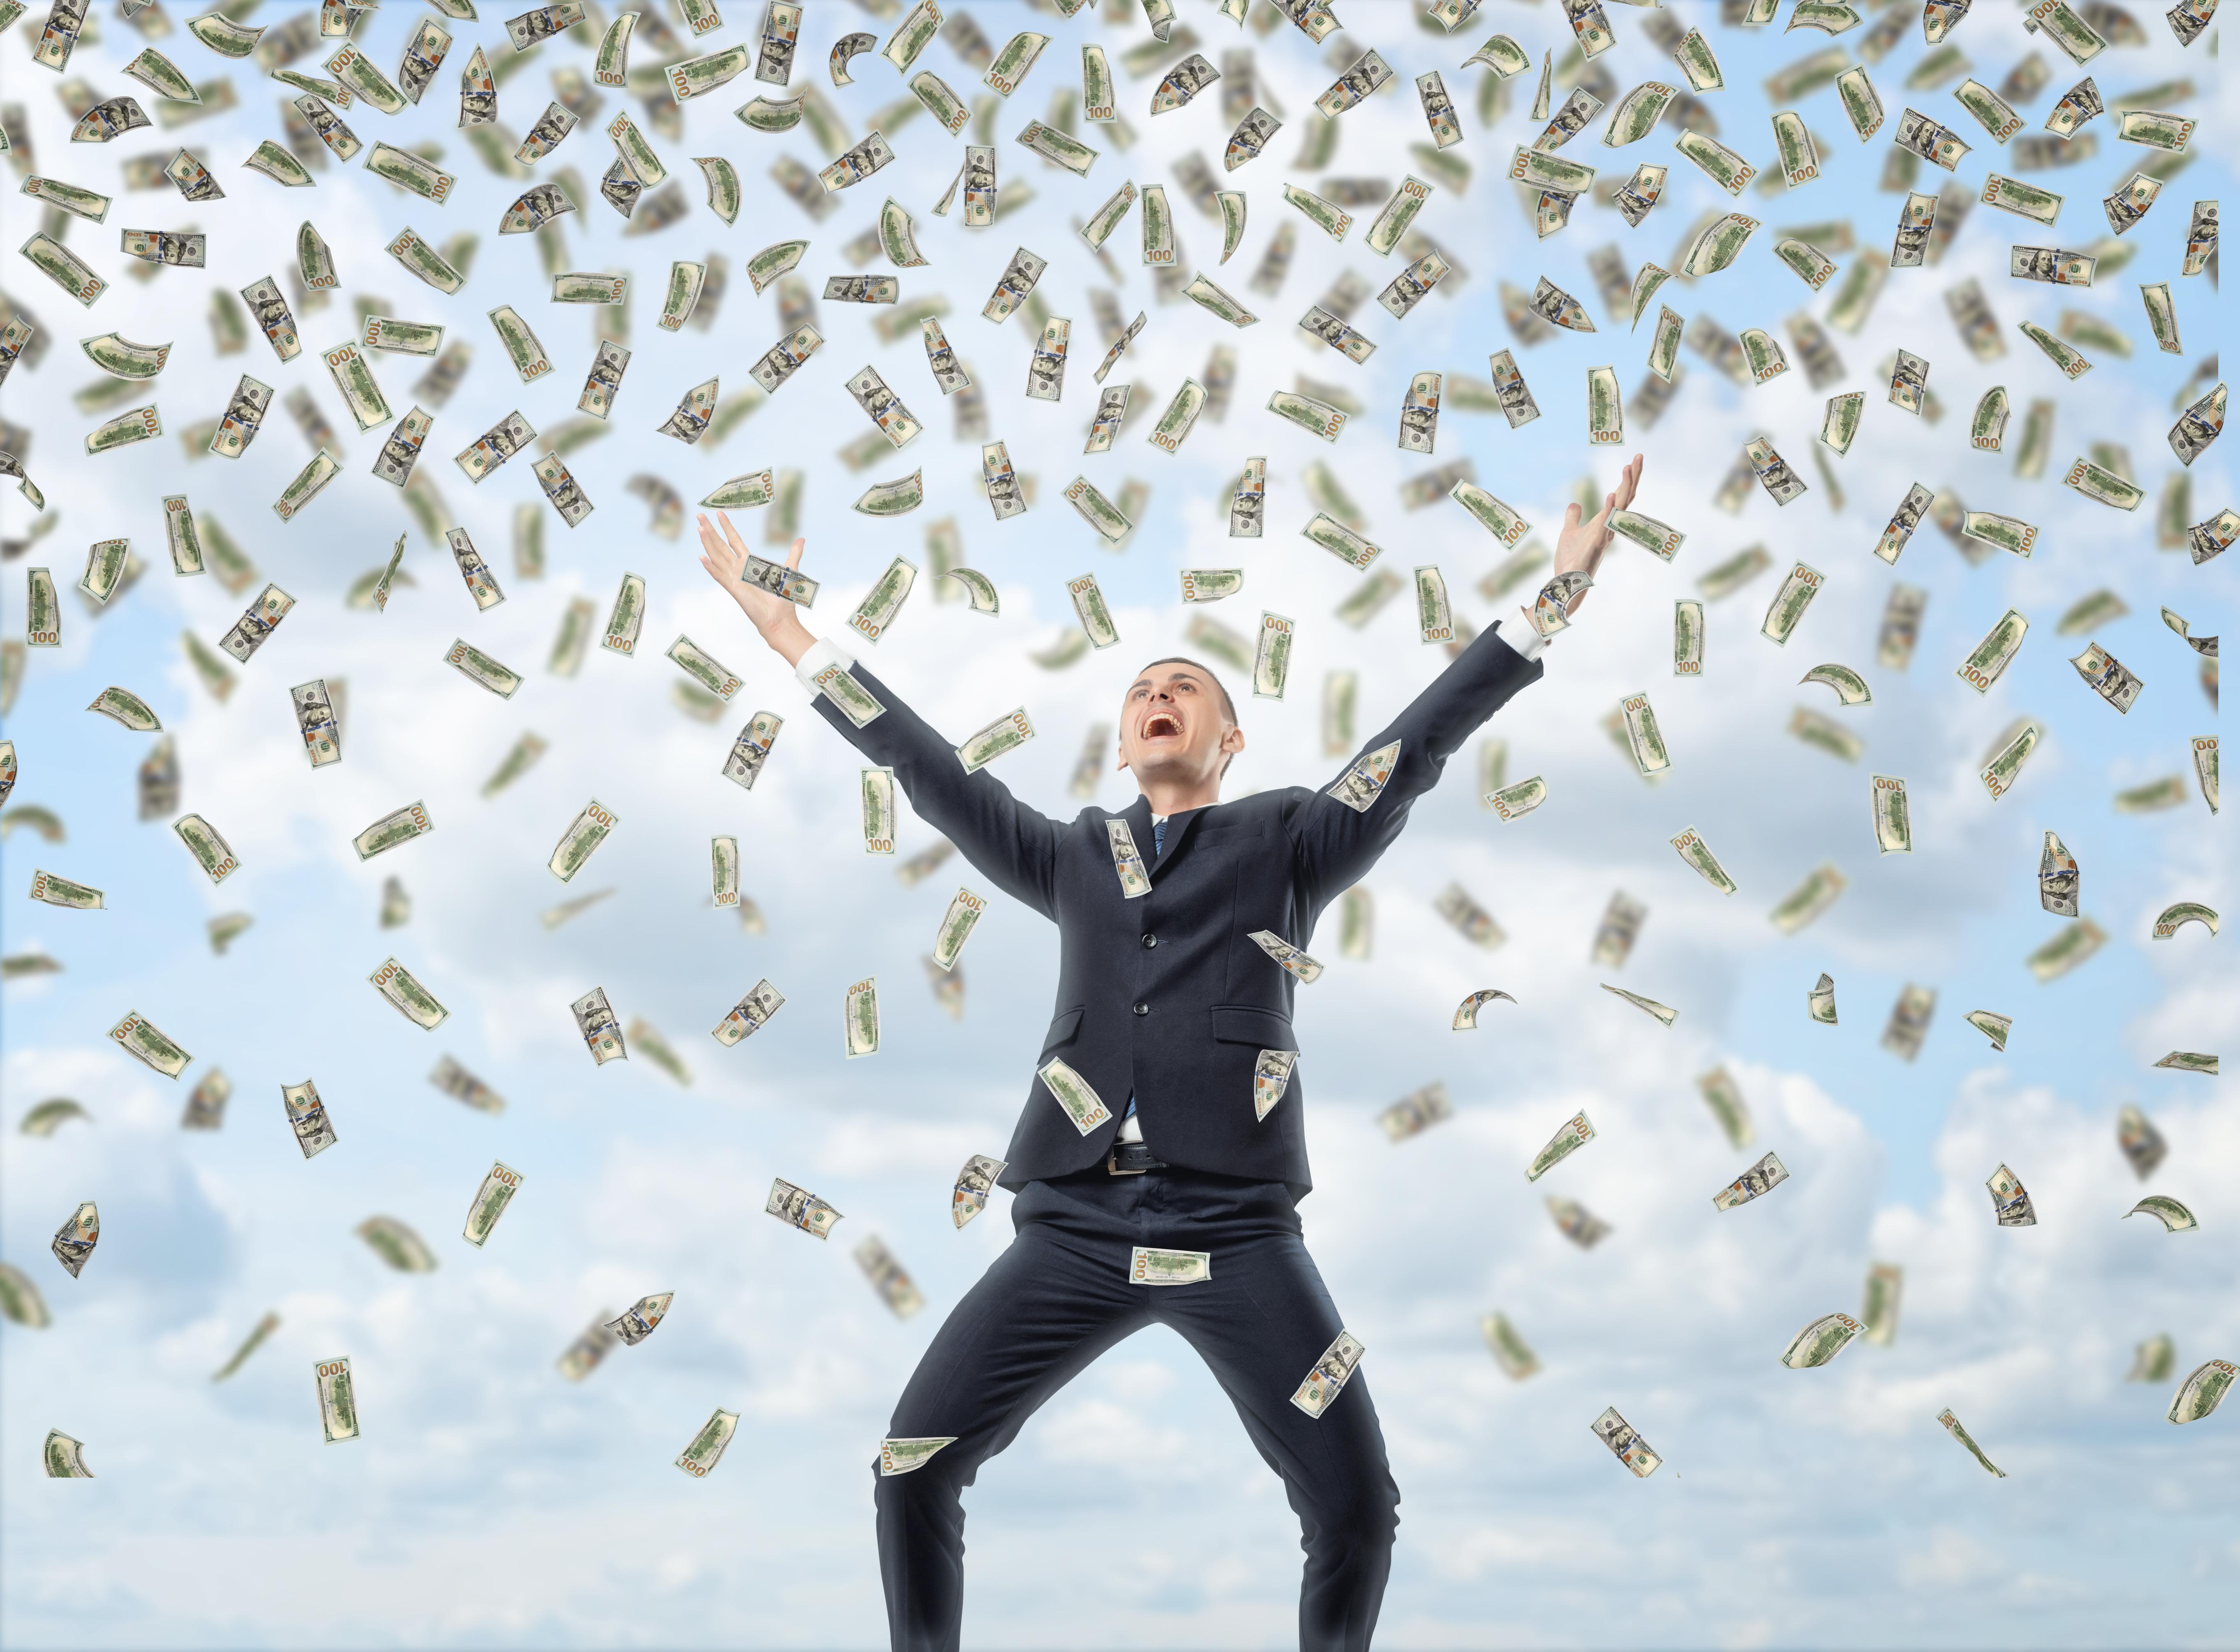 raining money on business man